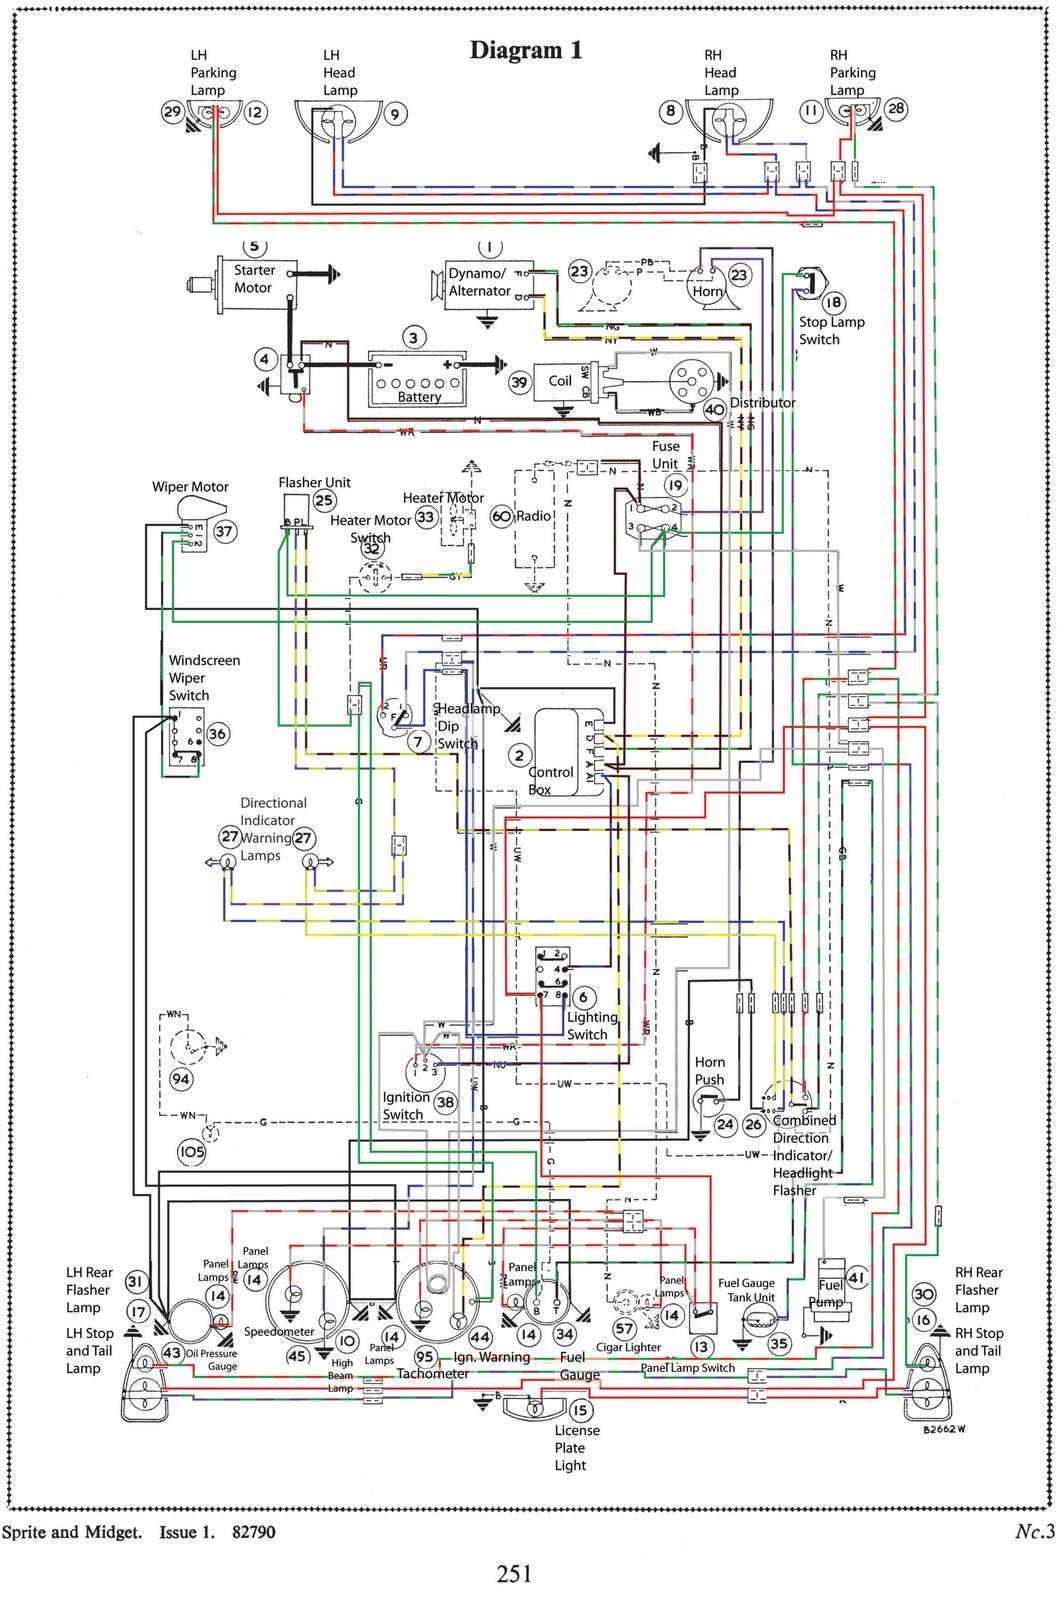 1975 mgb fuse box search for wiring diagrams u2022 rh stephenpoon co 1980 mgb fuse box [ 1064 x 1600 Pixel ]